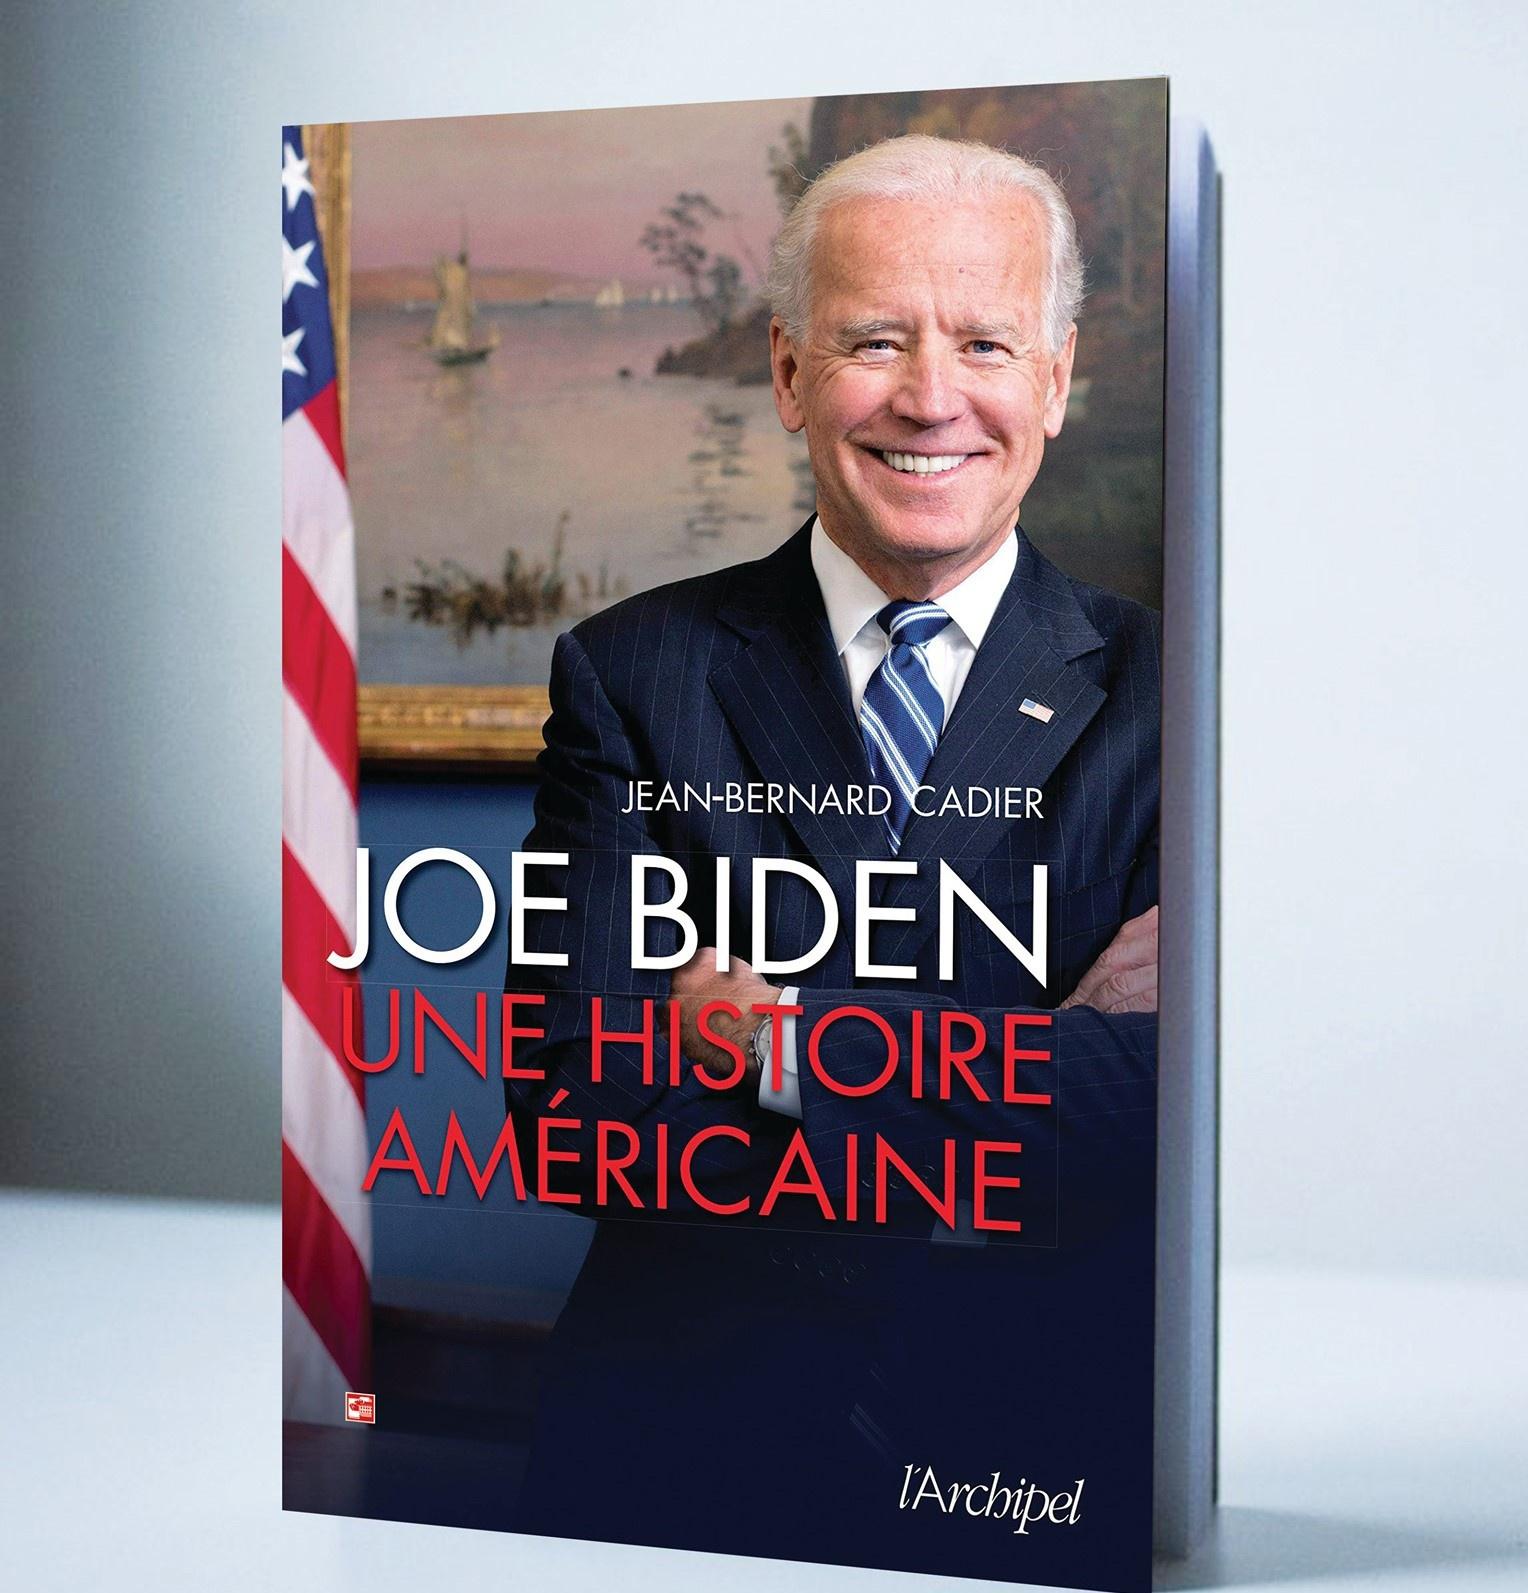 Sach ve Joe Biden anh 1